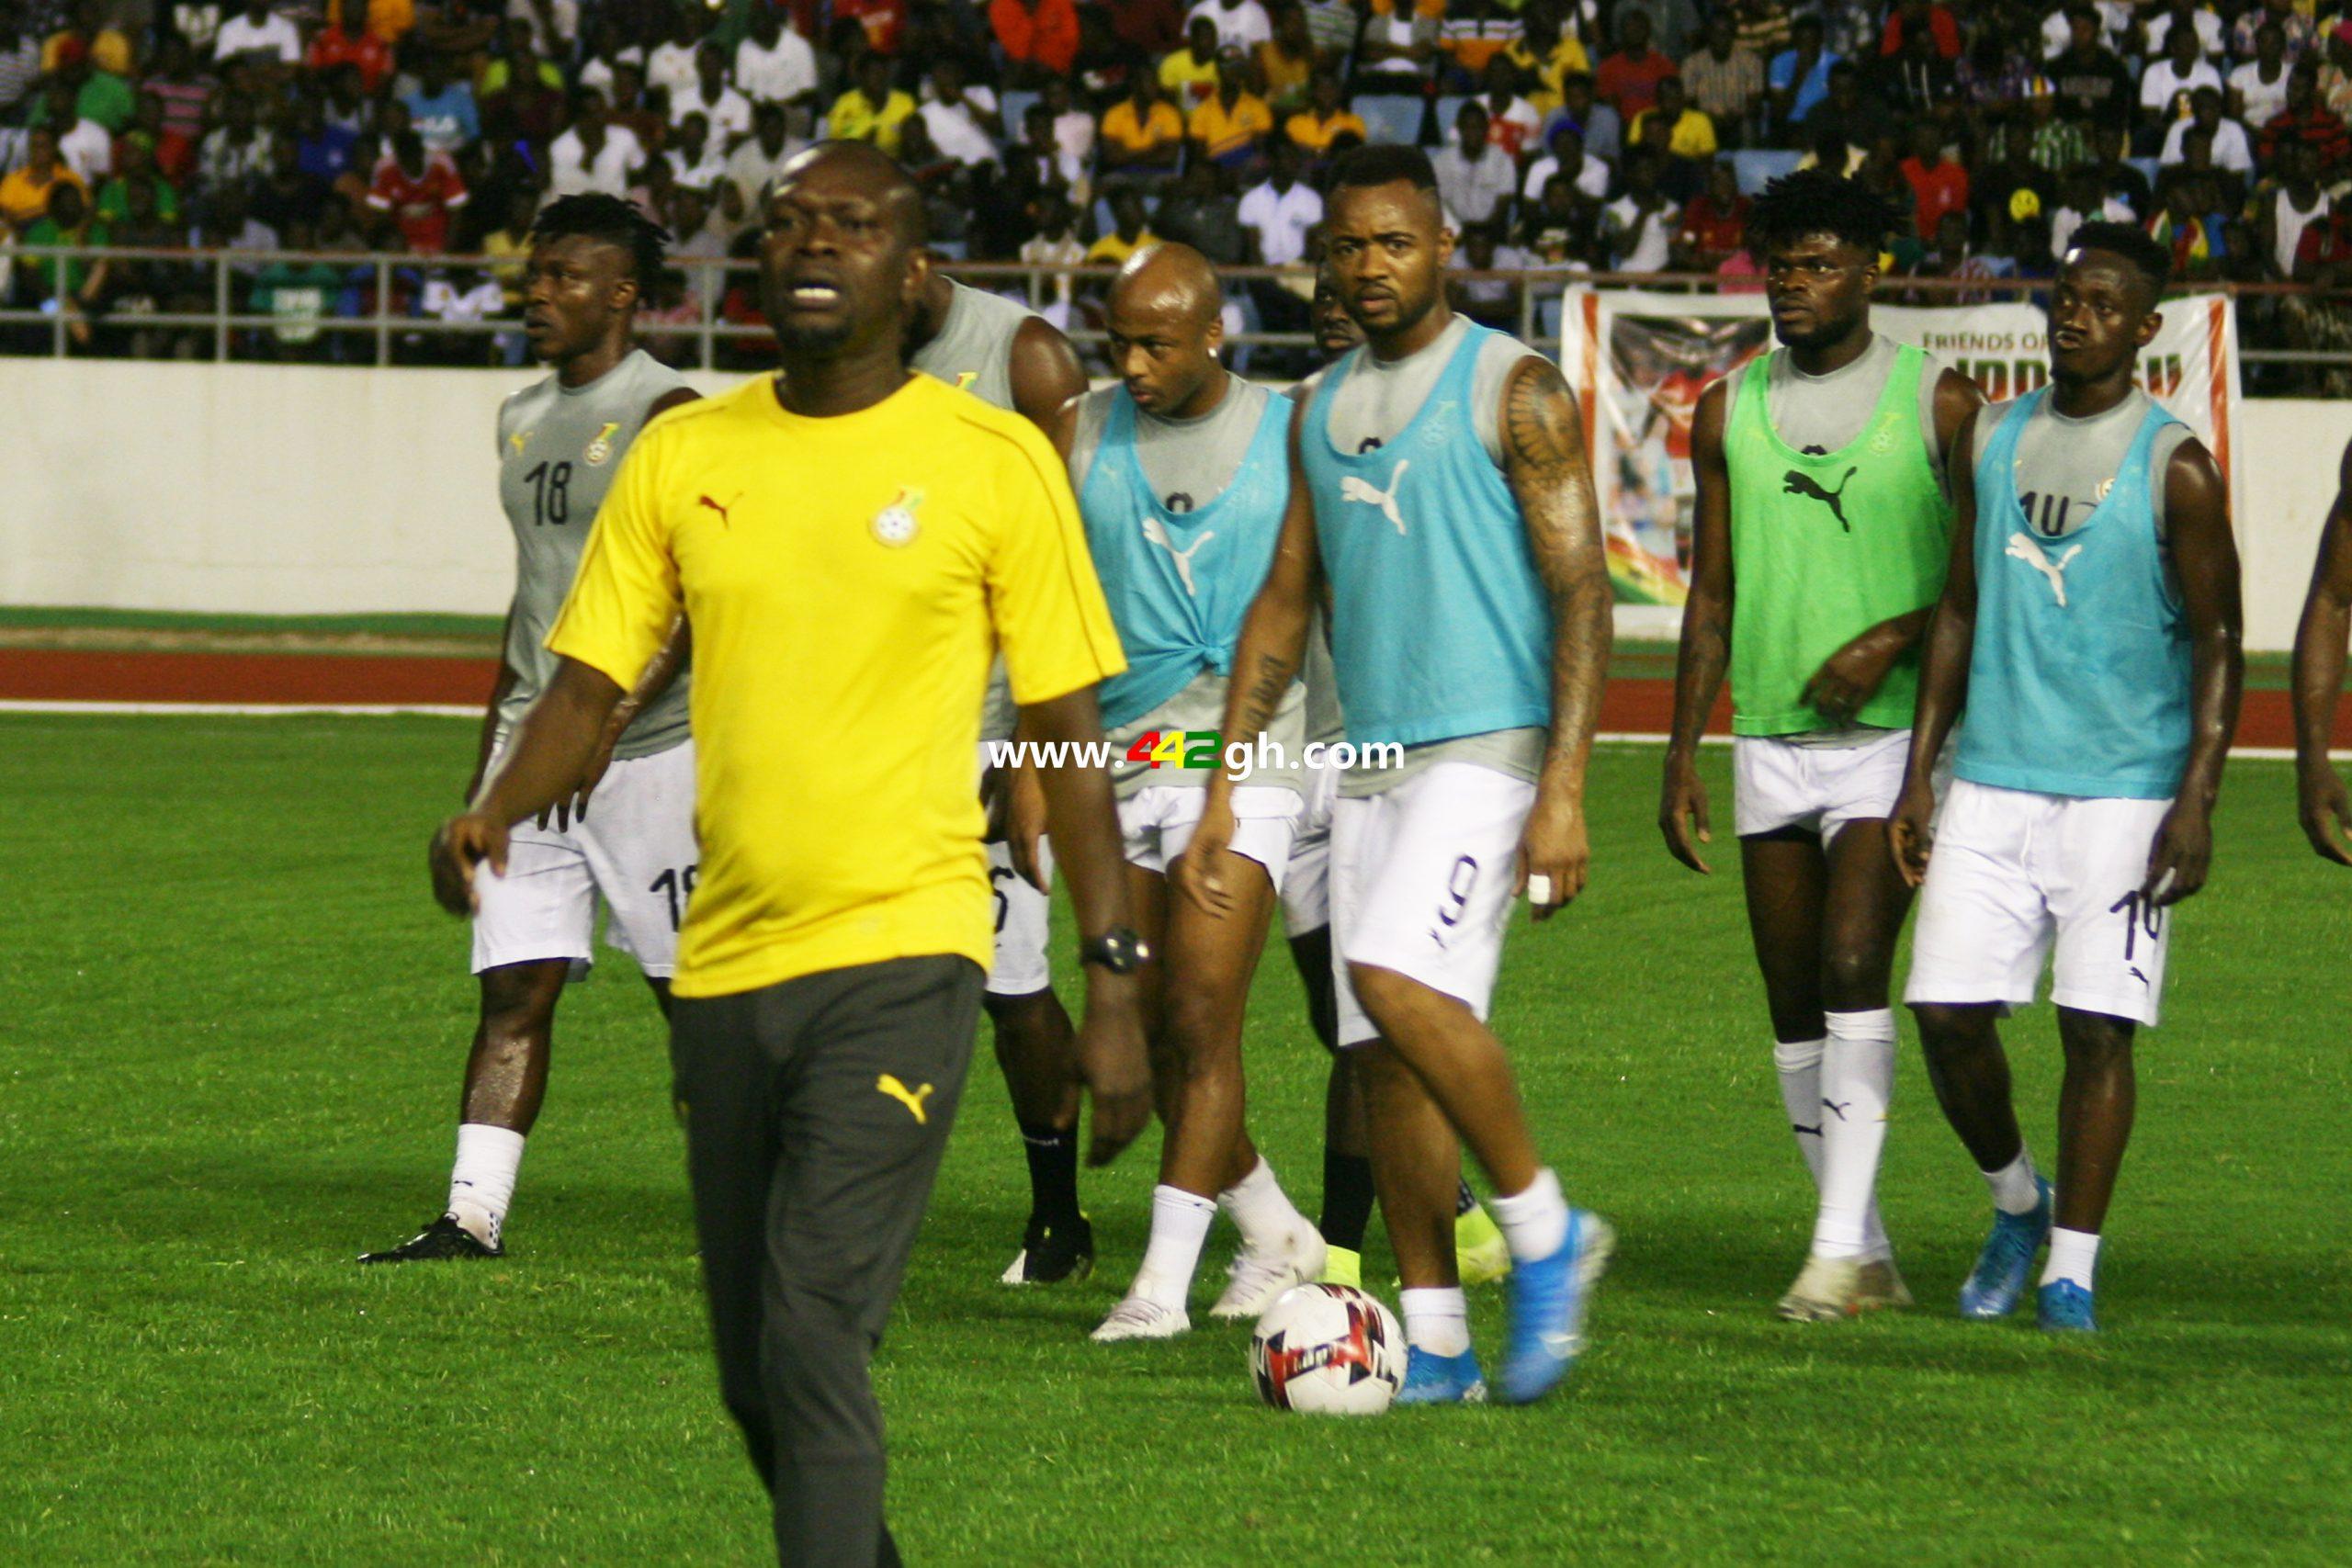 Black Stars coach CK Akonnor lauds Jordan Ayew for winning three top awards at Crystal Palace